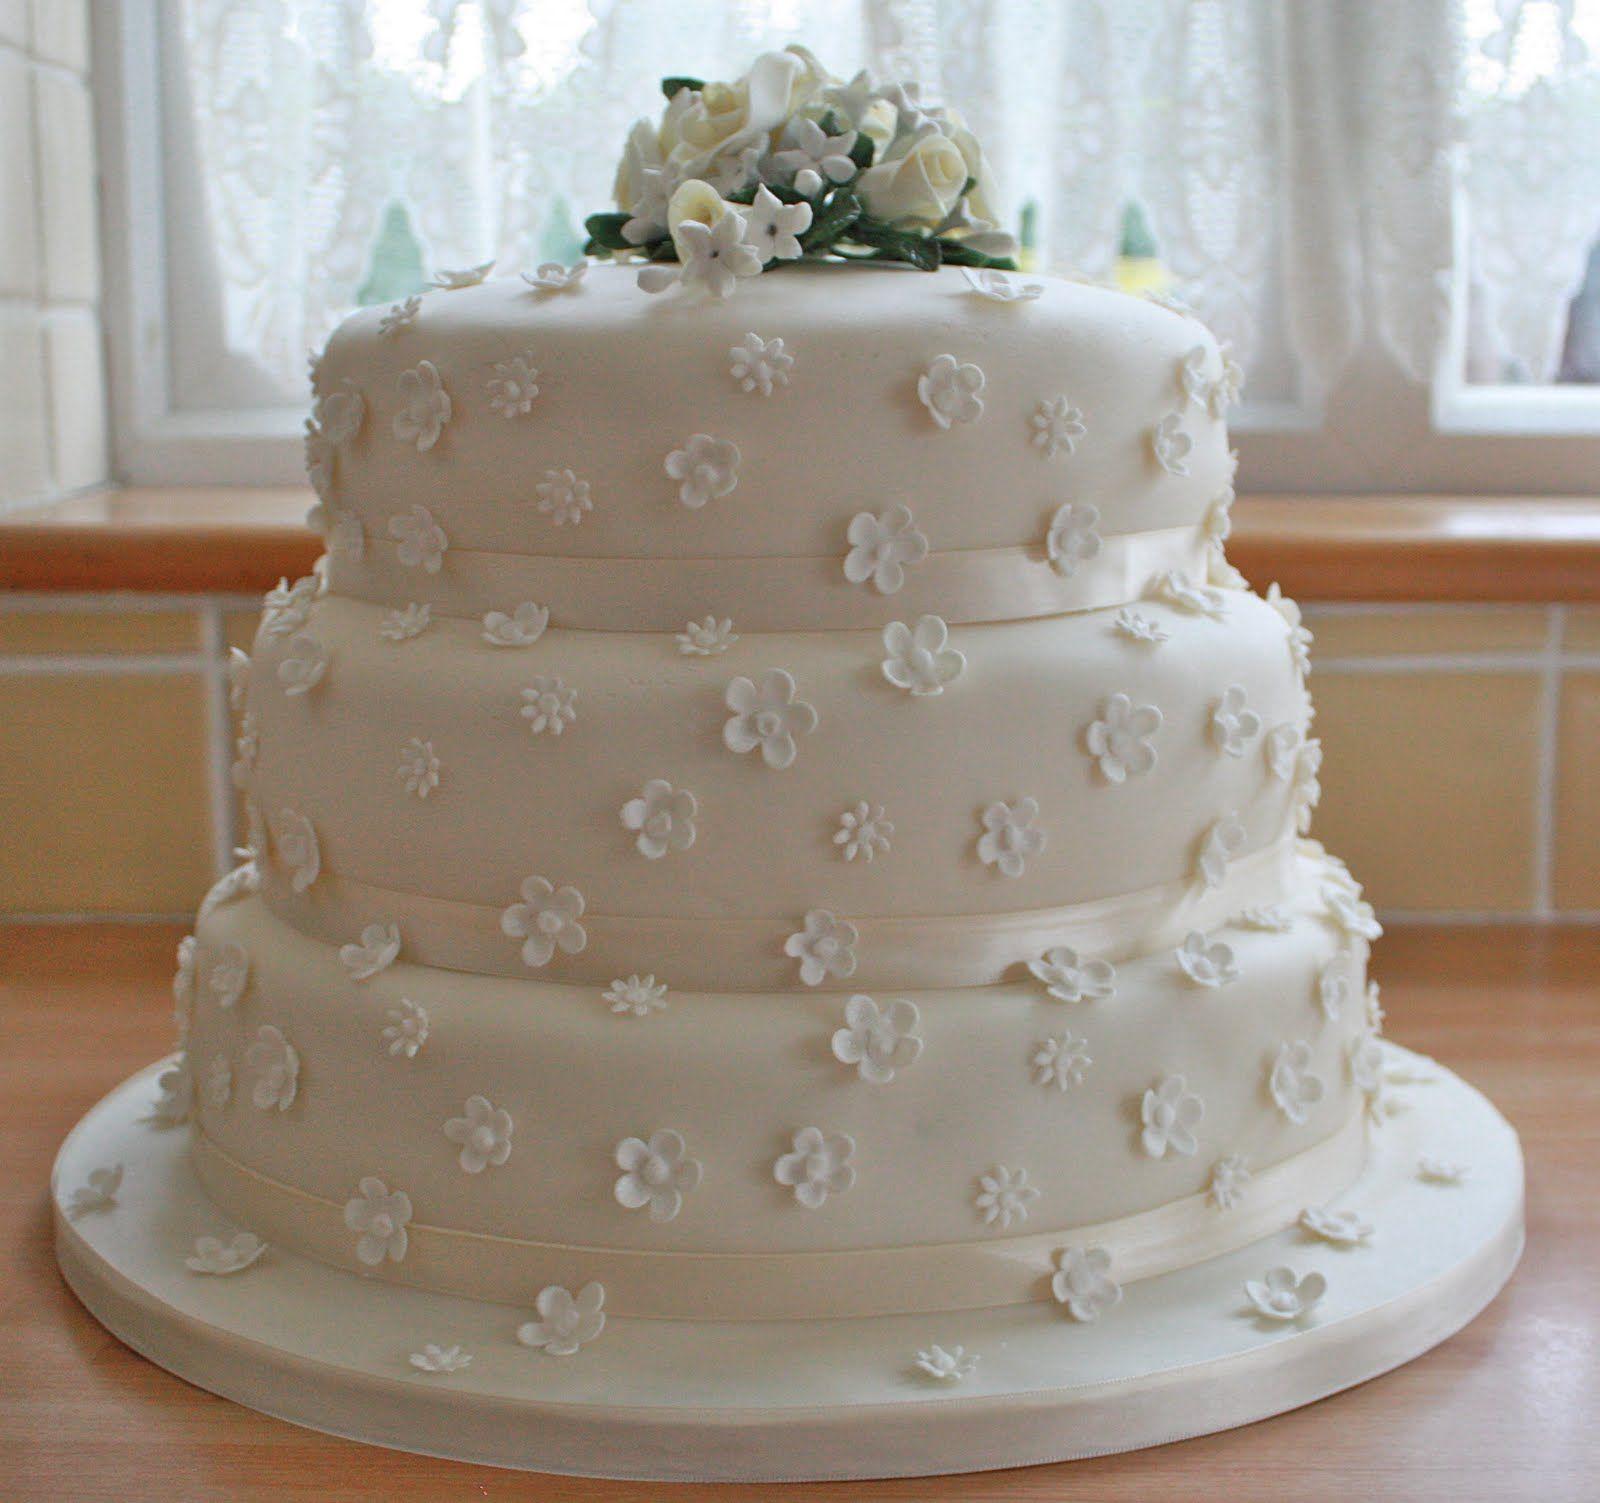 60th Wedding Anniverary Cake 60th Anniversary Cake Designs Http